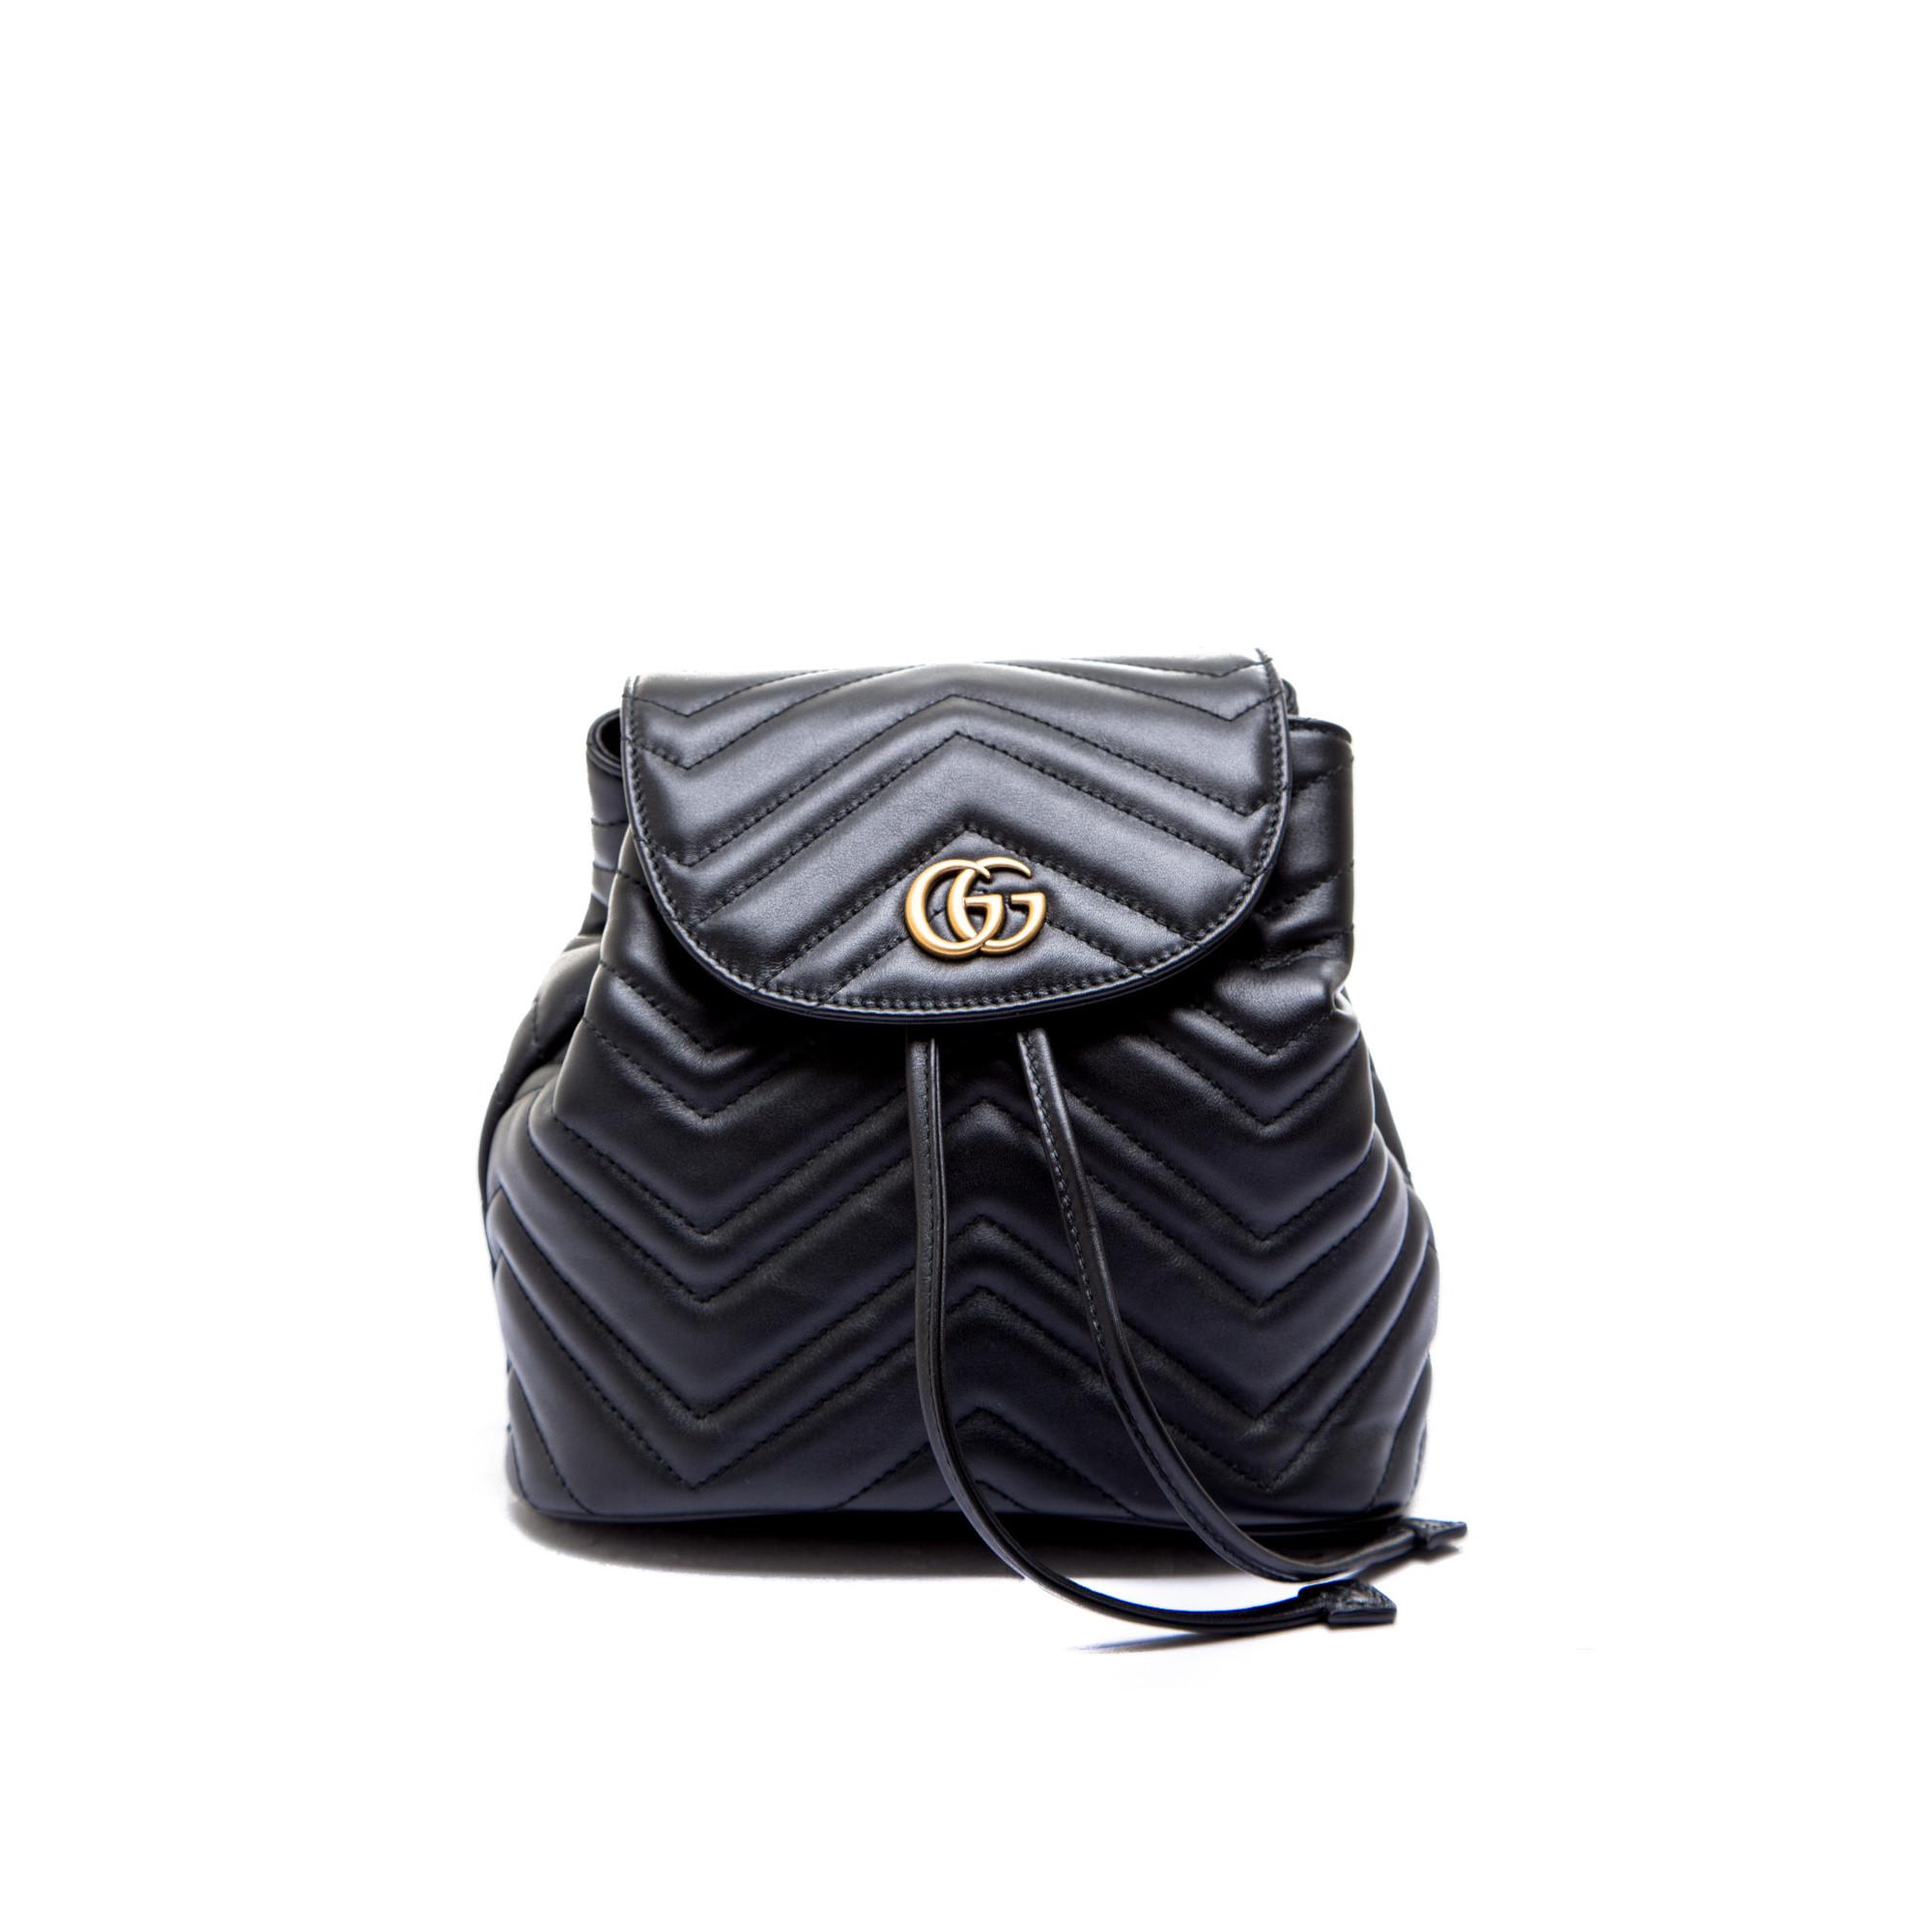 ce06e452bda250 Gucci backpack gg marmont black528129 / drw4t / 1000 ss19